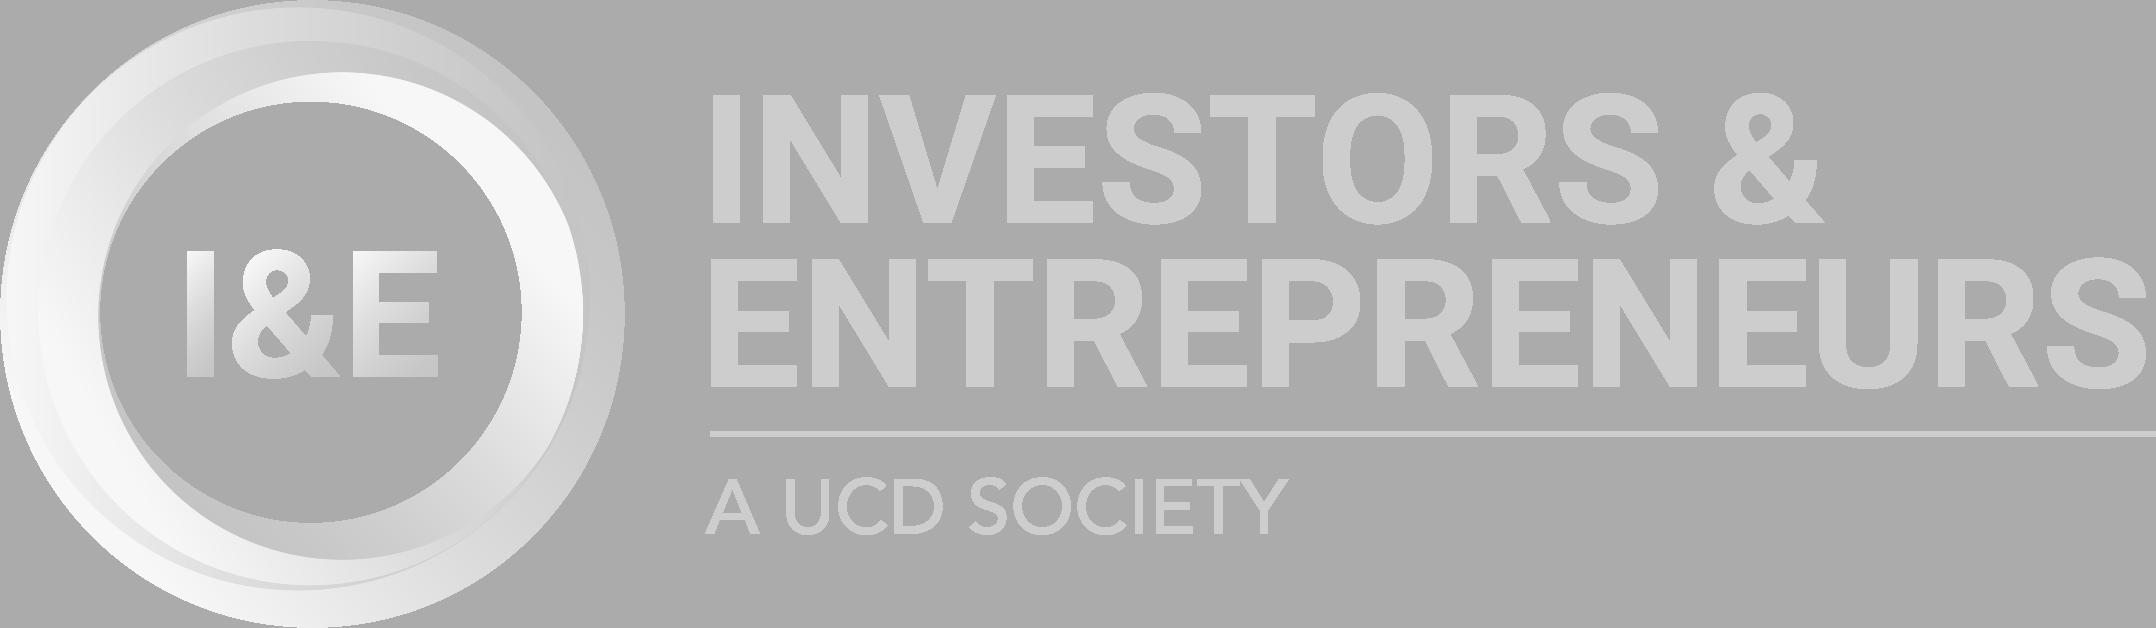 UCD I&E Society's Logo - Landscape Light